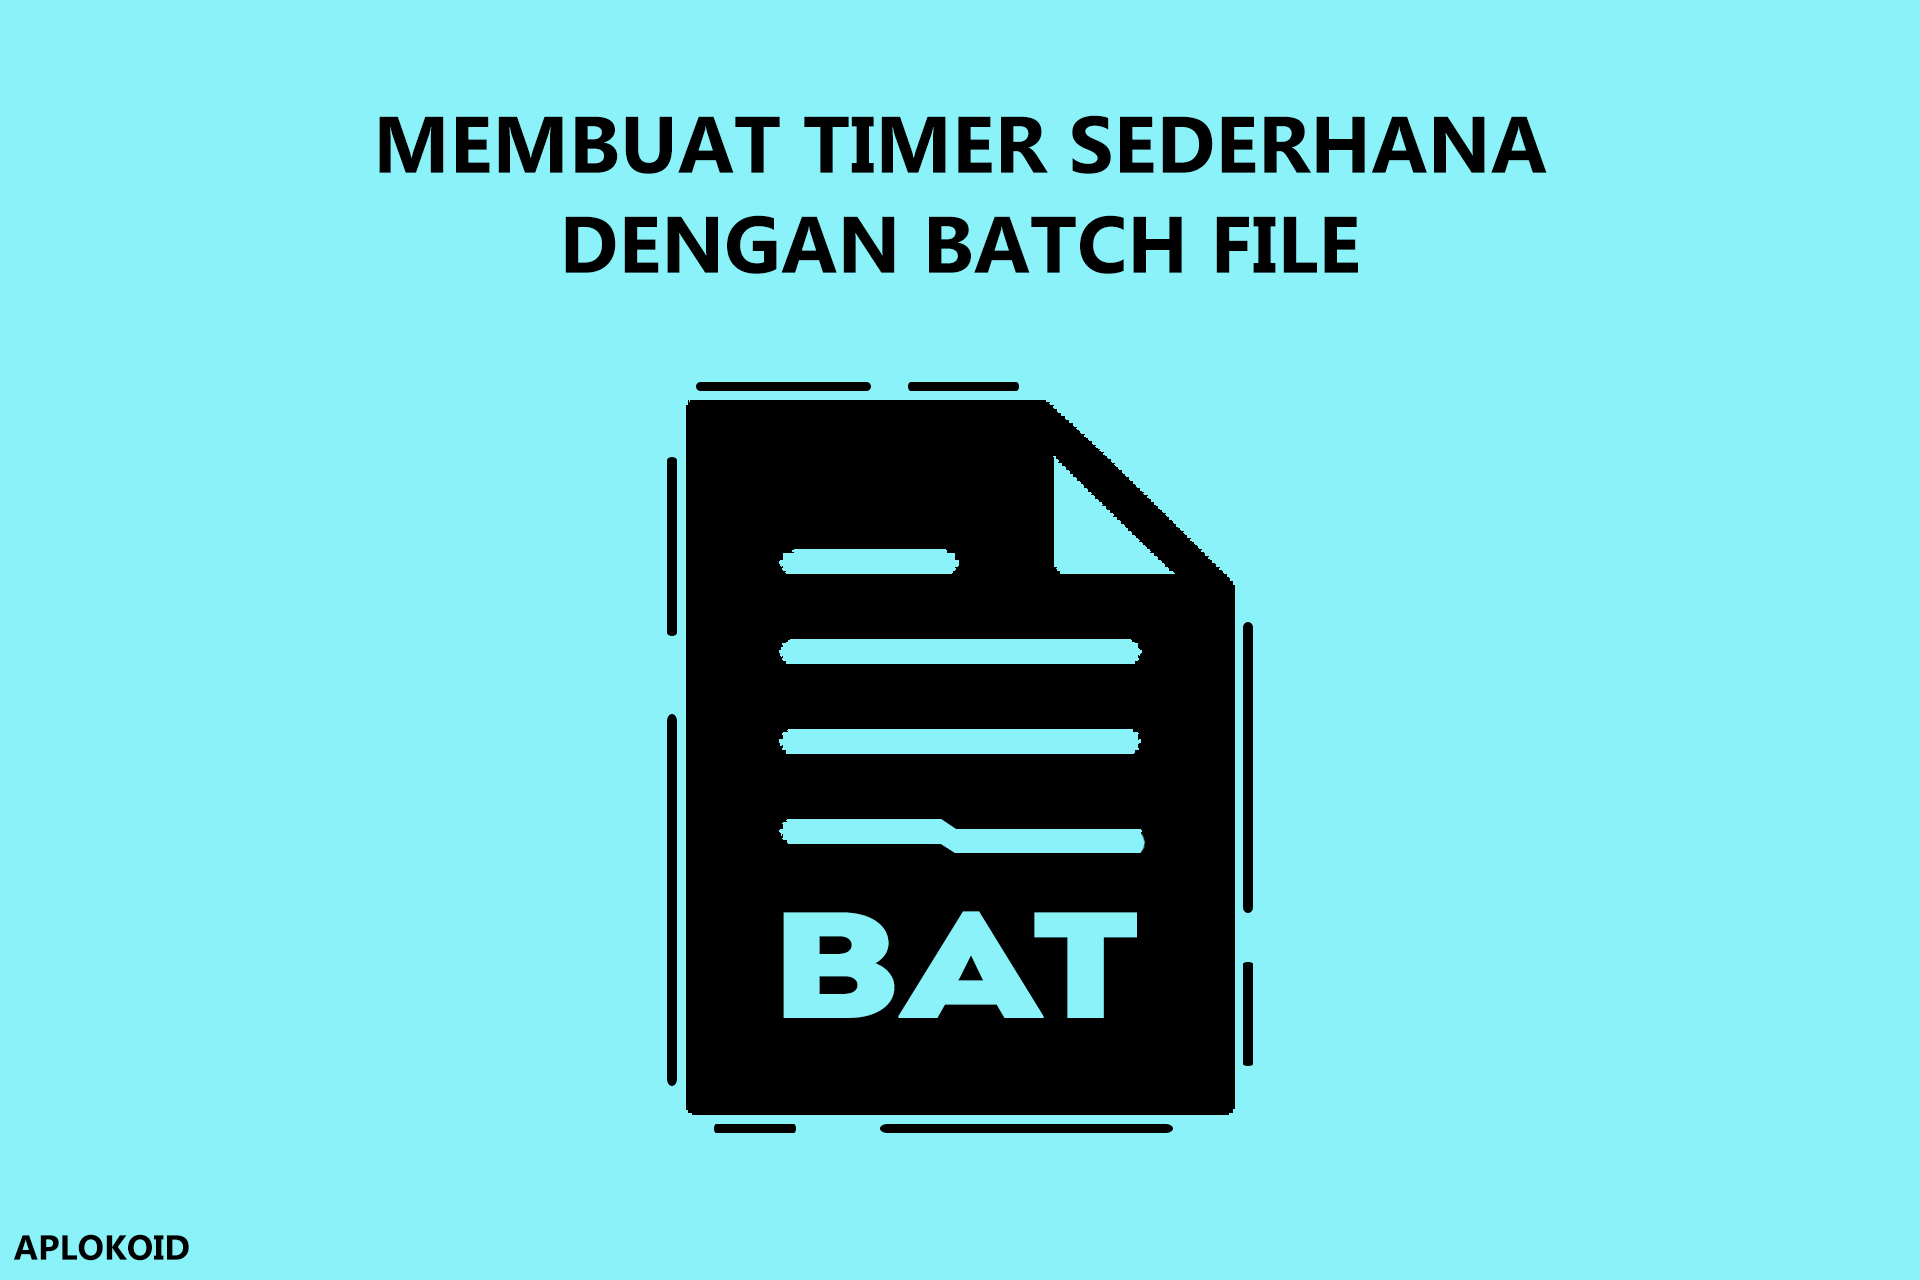 Cara Membuat Timer Sederhana Menggunakan Notepad dan Batch File